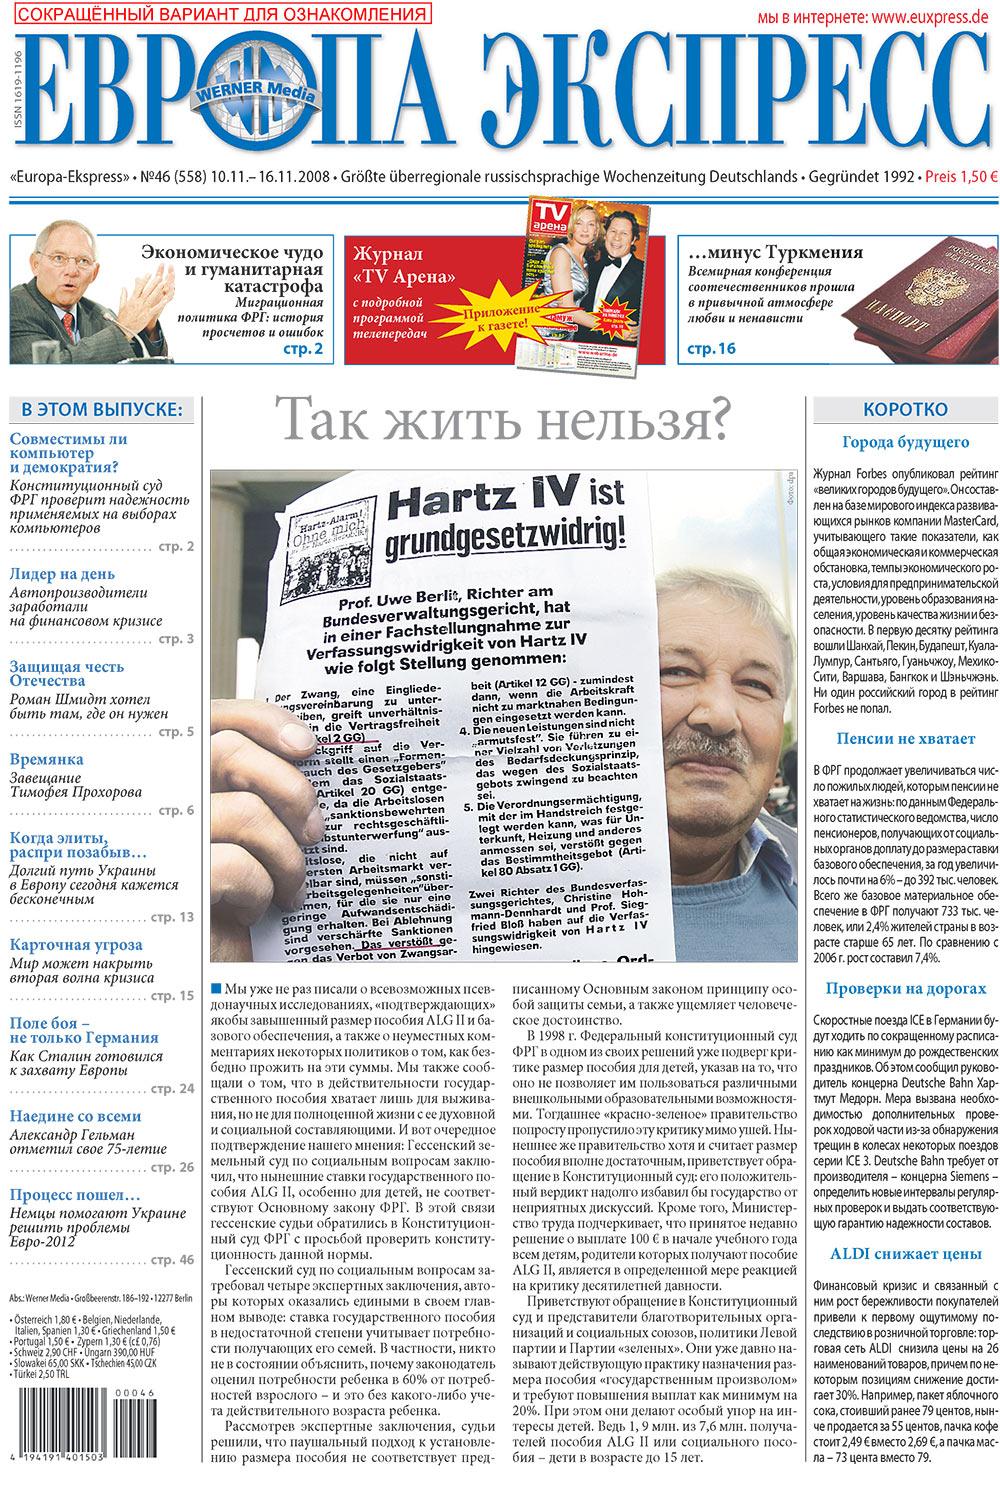 Европа экспресс (газета). 2008 год, номер 46, стр. 1